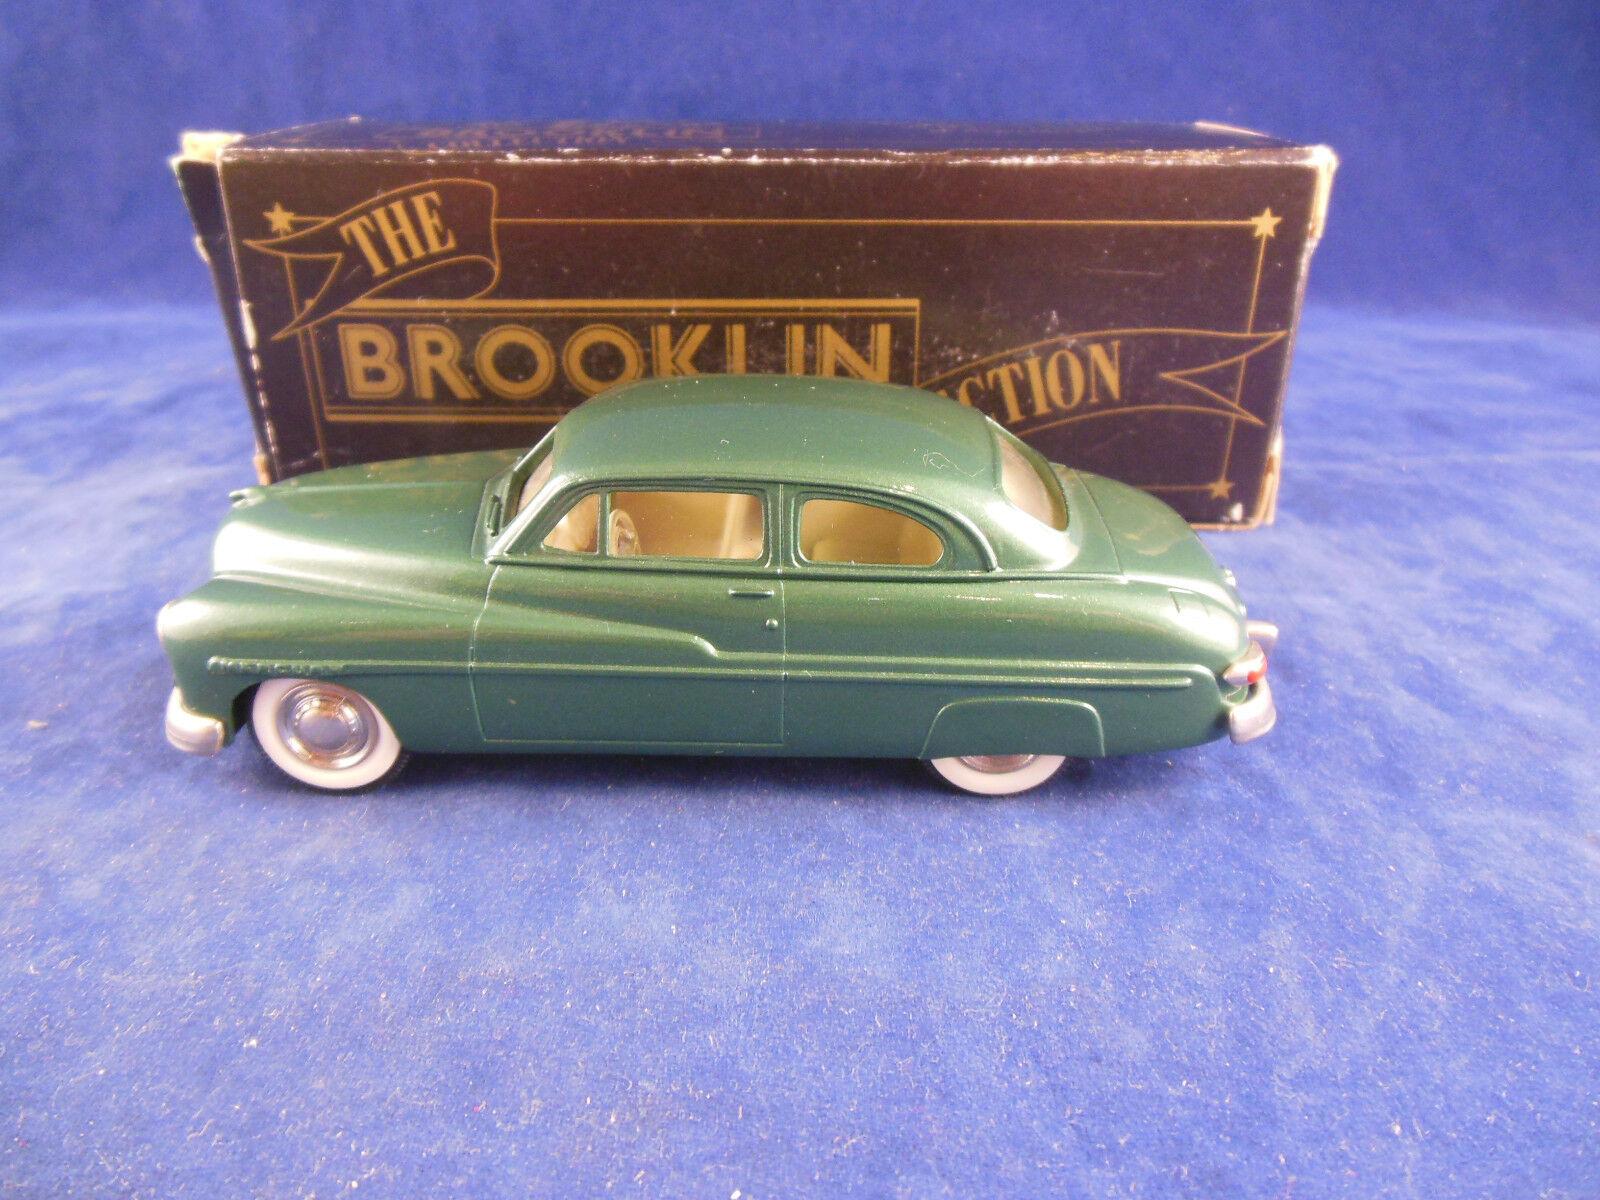 bienvenido a orden Brooklin modelos BRK15 1949 Mercury 2 Puerta Coupe Coupe Coupe en Metálico Oscuro verde  elige tu favorito